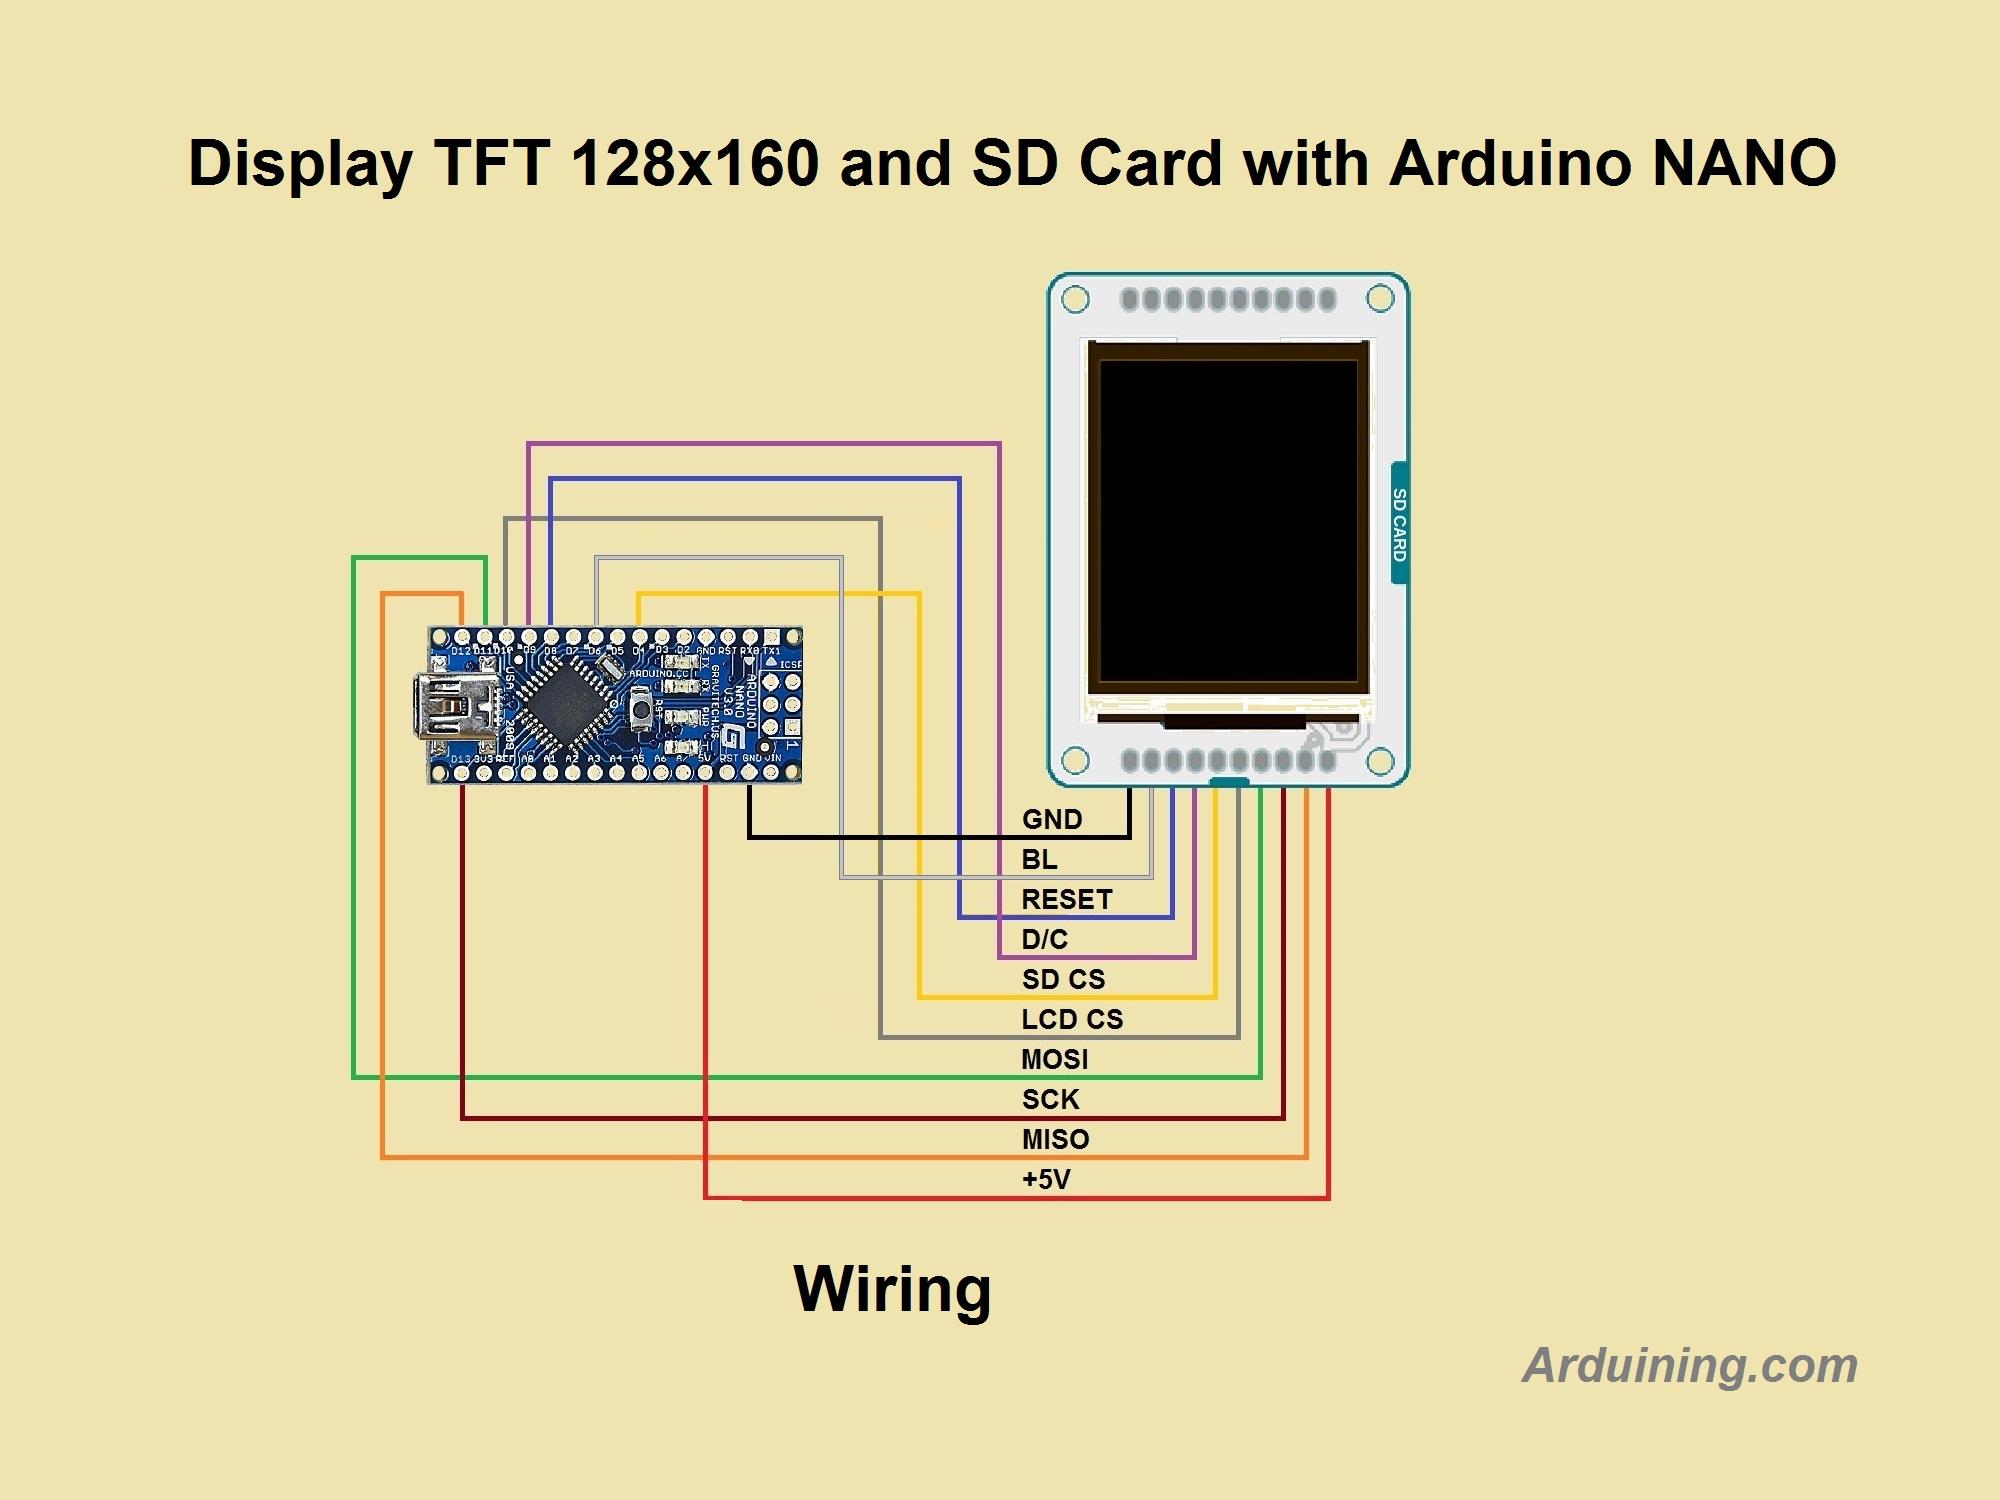 Tft Wiring Diagram Diagrams Data Base Skema Samsung Ln26b350f1 Ln32b350f1 Lcd Tv Circuit Display To Arduino Nano Arduining Rh Com On Reversing Camera